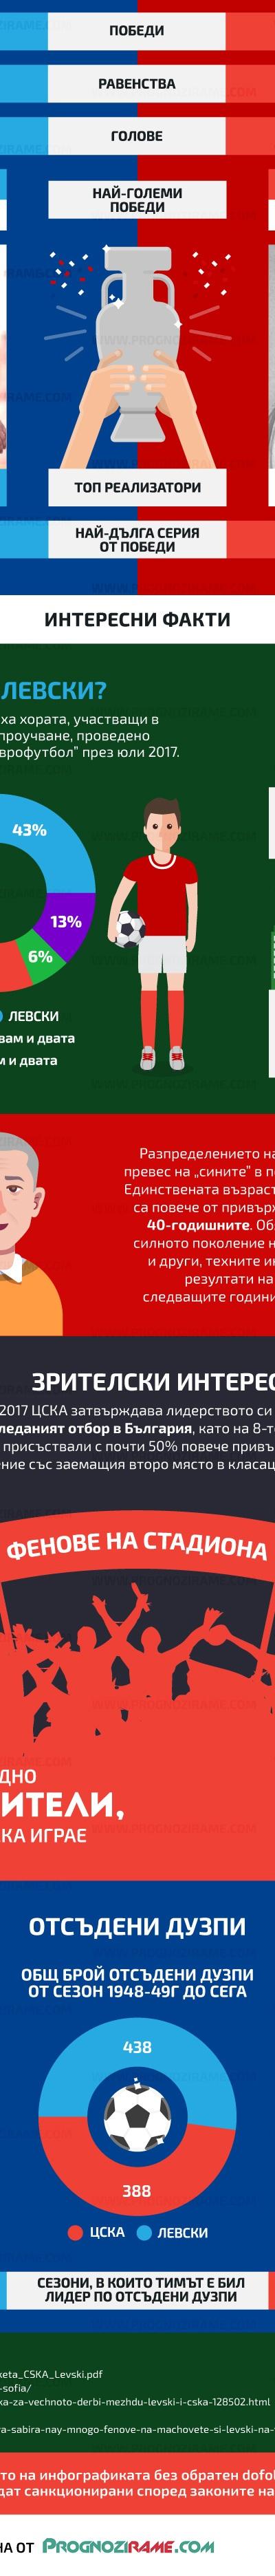 Левски срещу ЦСКА - prognozirame.com [5]